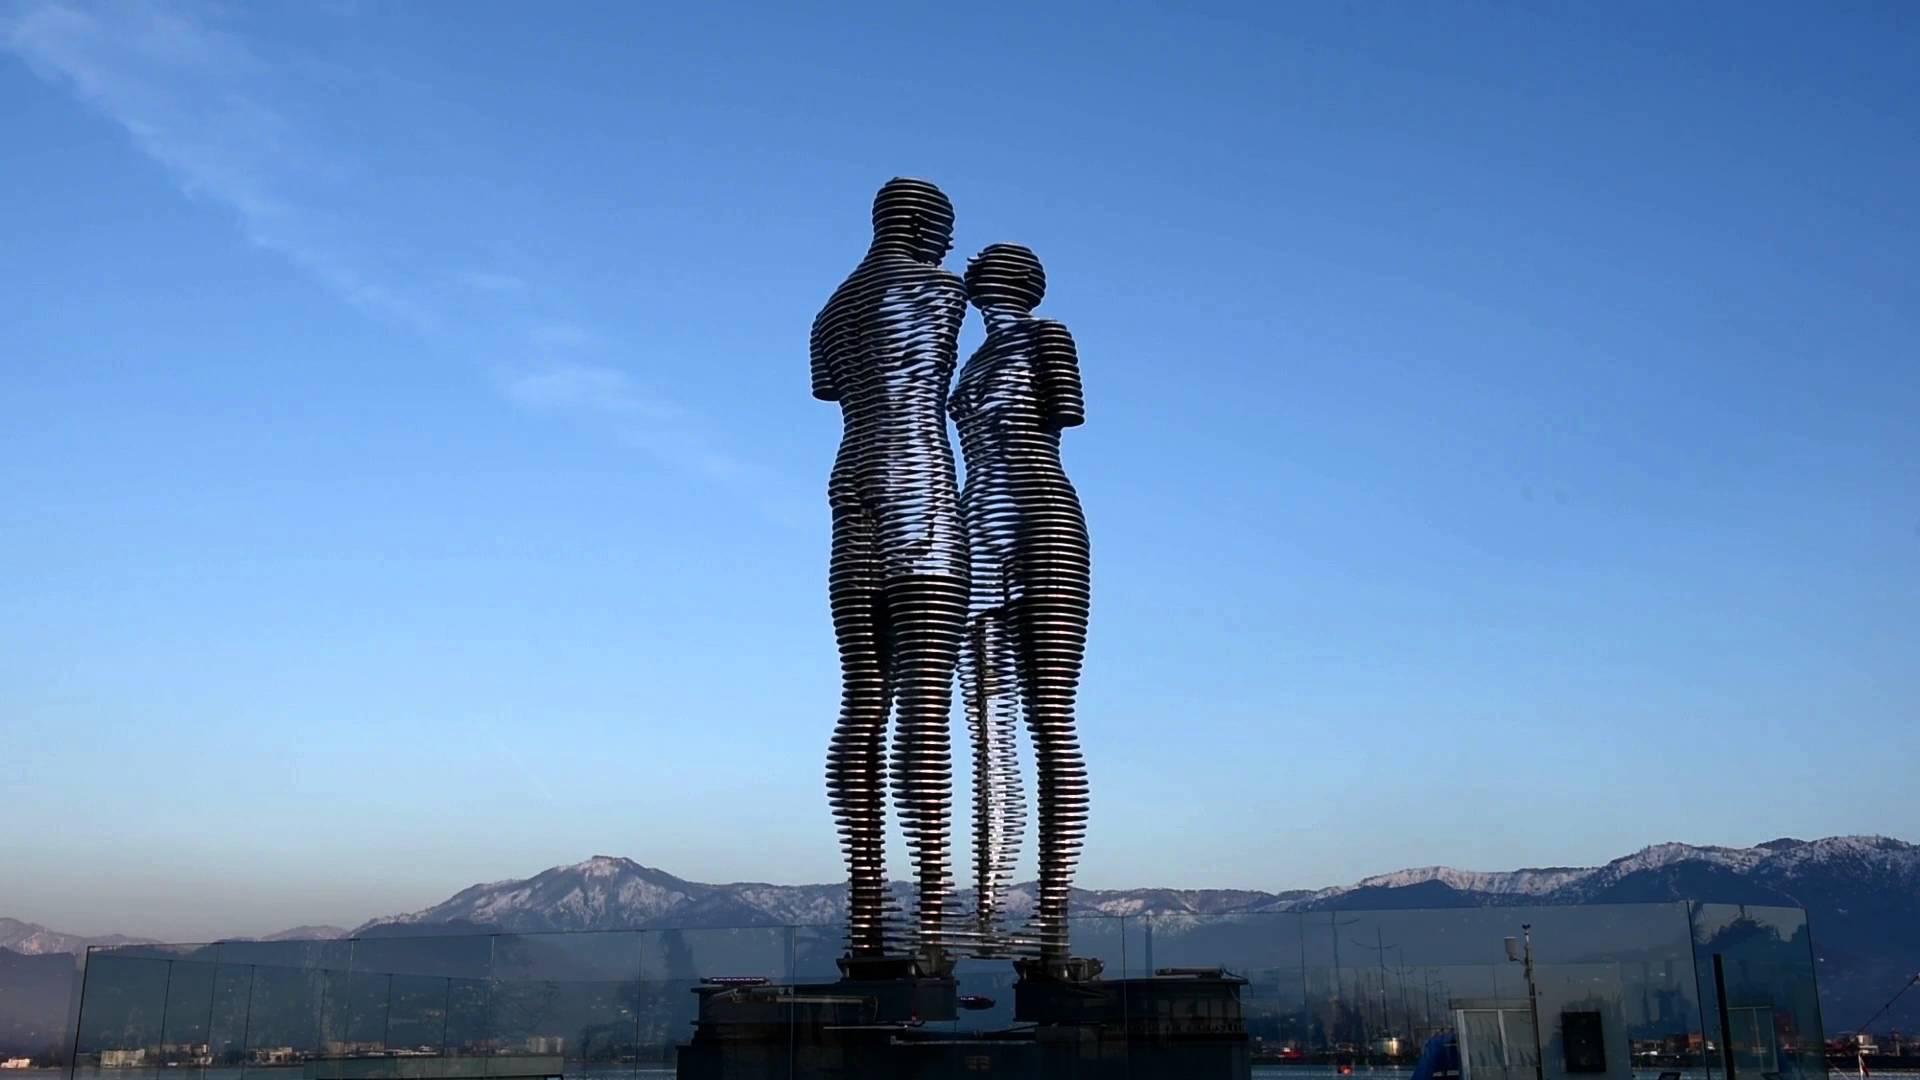 Moving the statue of Ali and Nino Batumi embankment